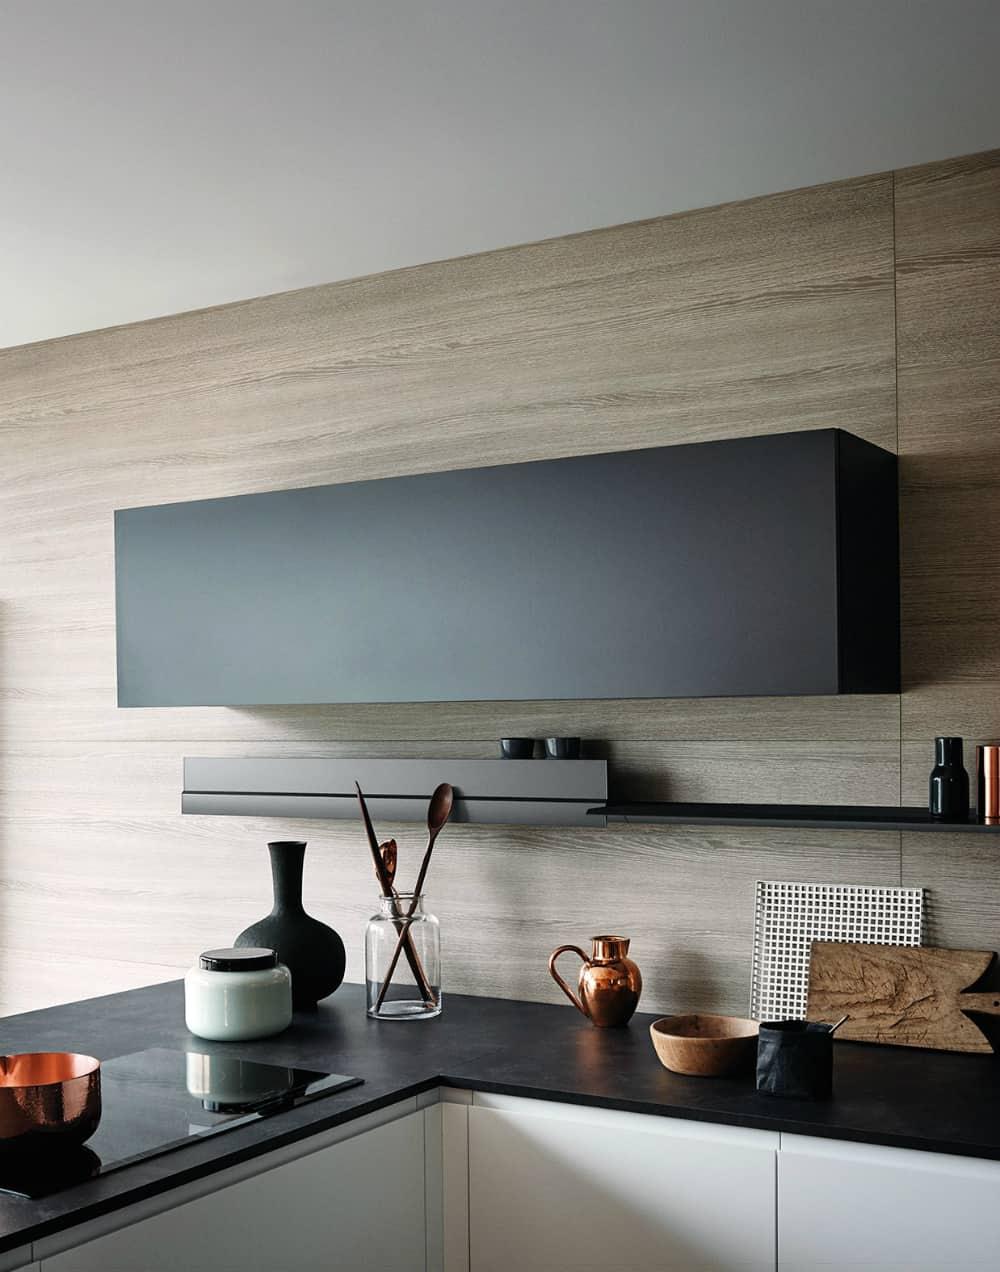 Sleek cabinet shape